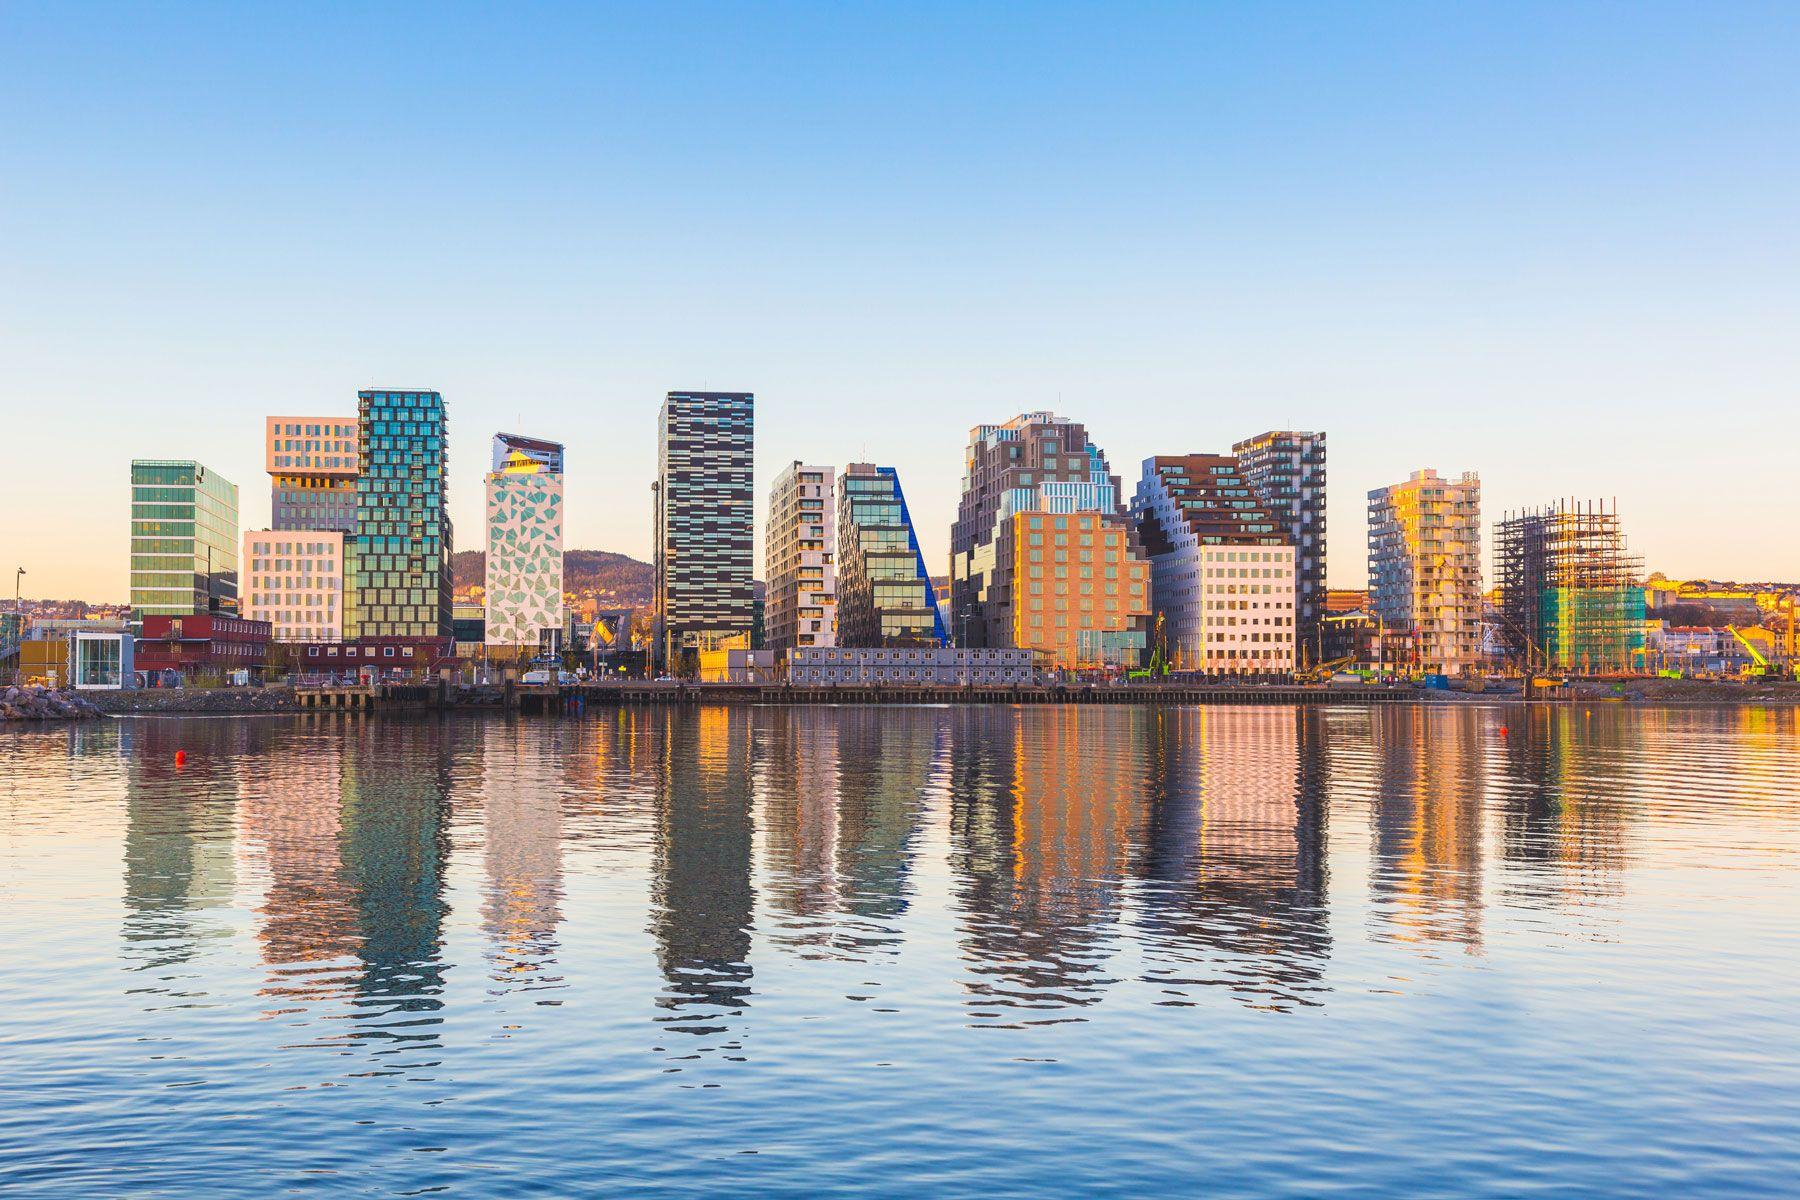 Oslo iStock502836942 web